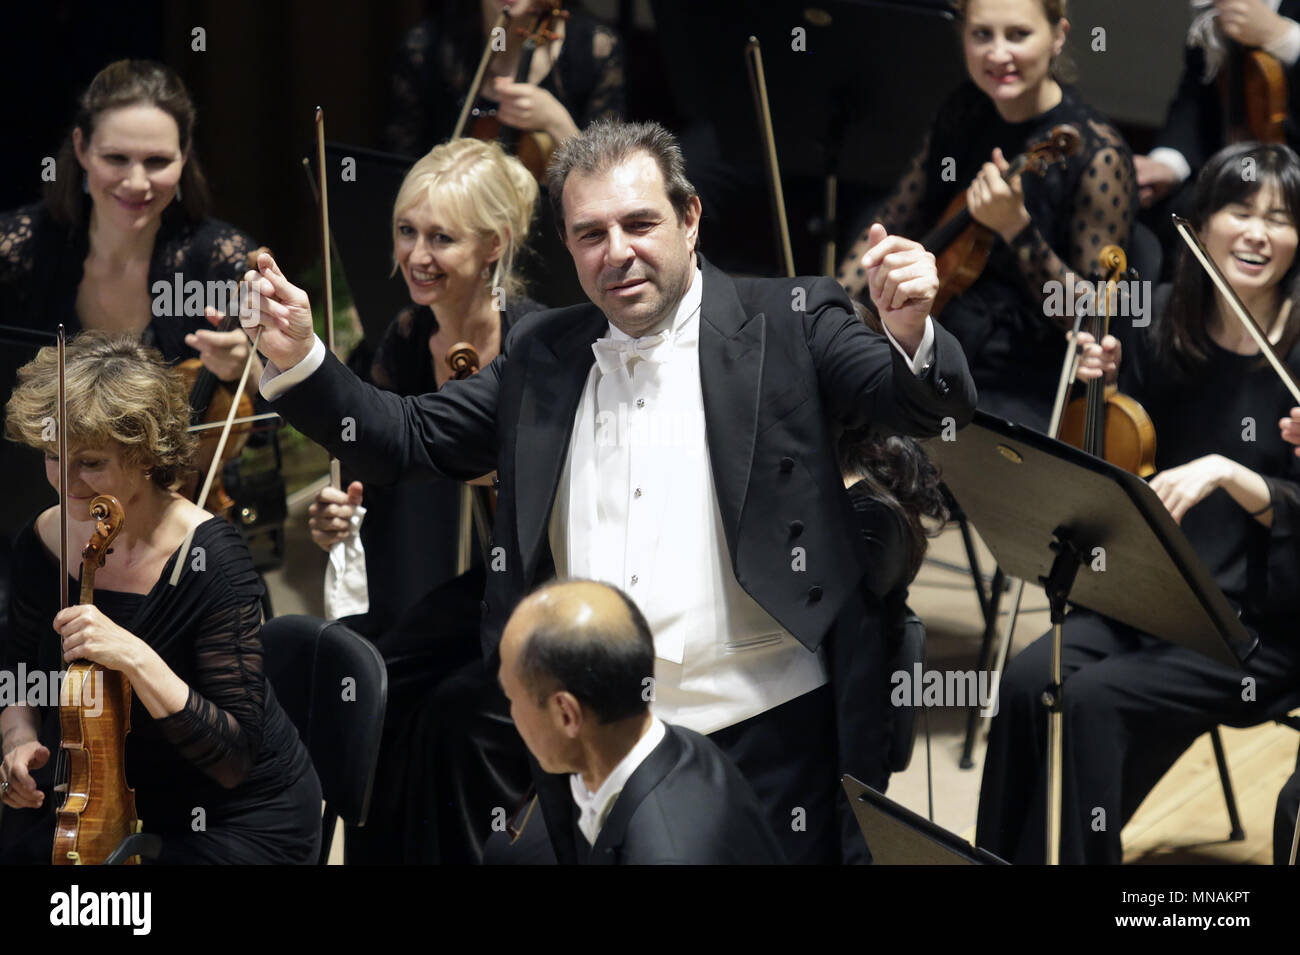 Prague, Czech Republic. 15th May, 2018. Italian conductor Daniele Gatti conducts concert of Royal Orchestra Concertgebouw Amsterdam during the 73rd Prague Spring international music festival in Prague, Czech Republic, on May 15, 2018. Credit: Michaela Rihova/CTK Photo/Alamy Live News Stock Photo